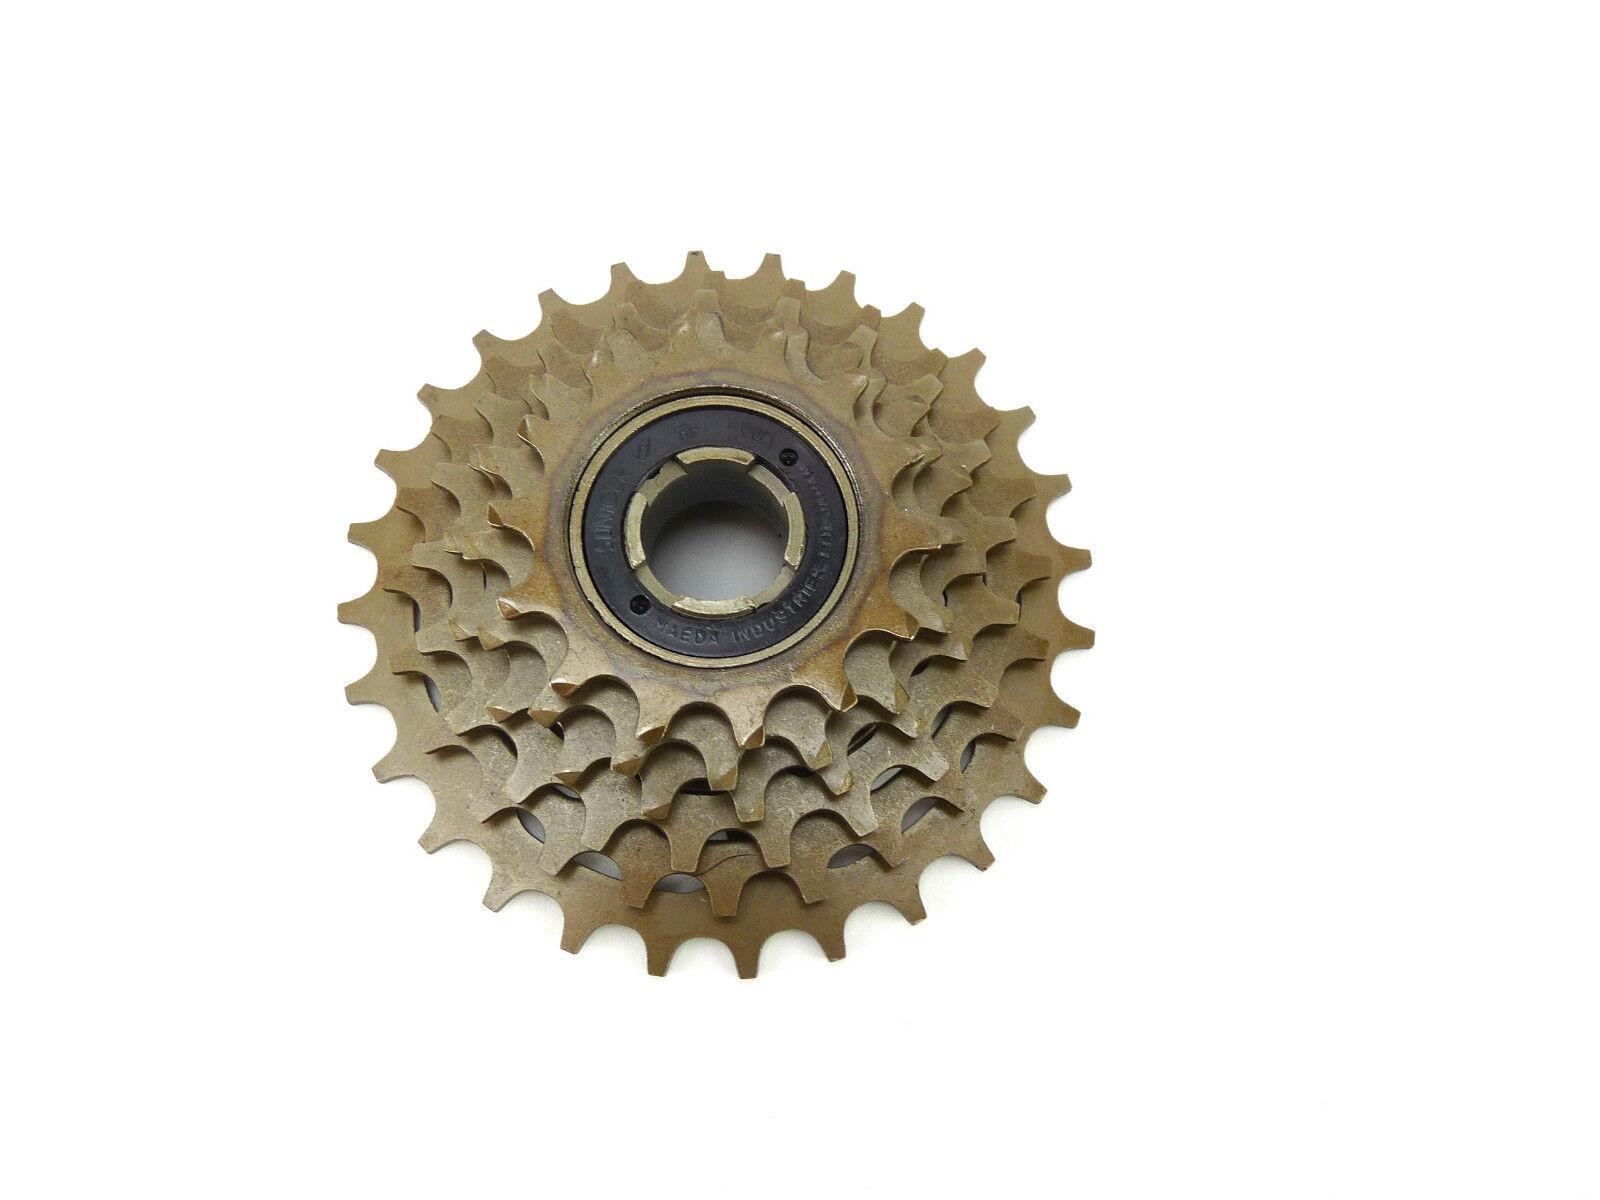 Suntour rueda libre Accushift 6 velocidad 14-28 Bicicleta Vintage Alfa ganador nos